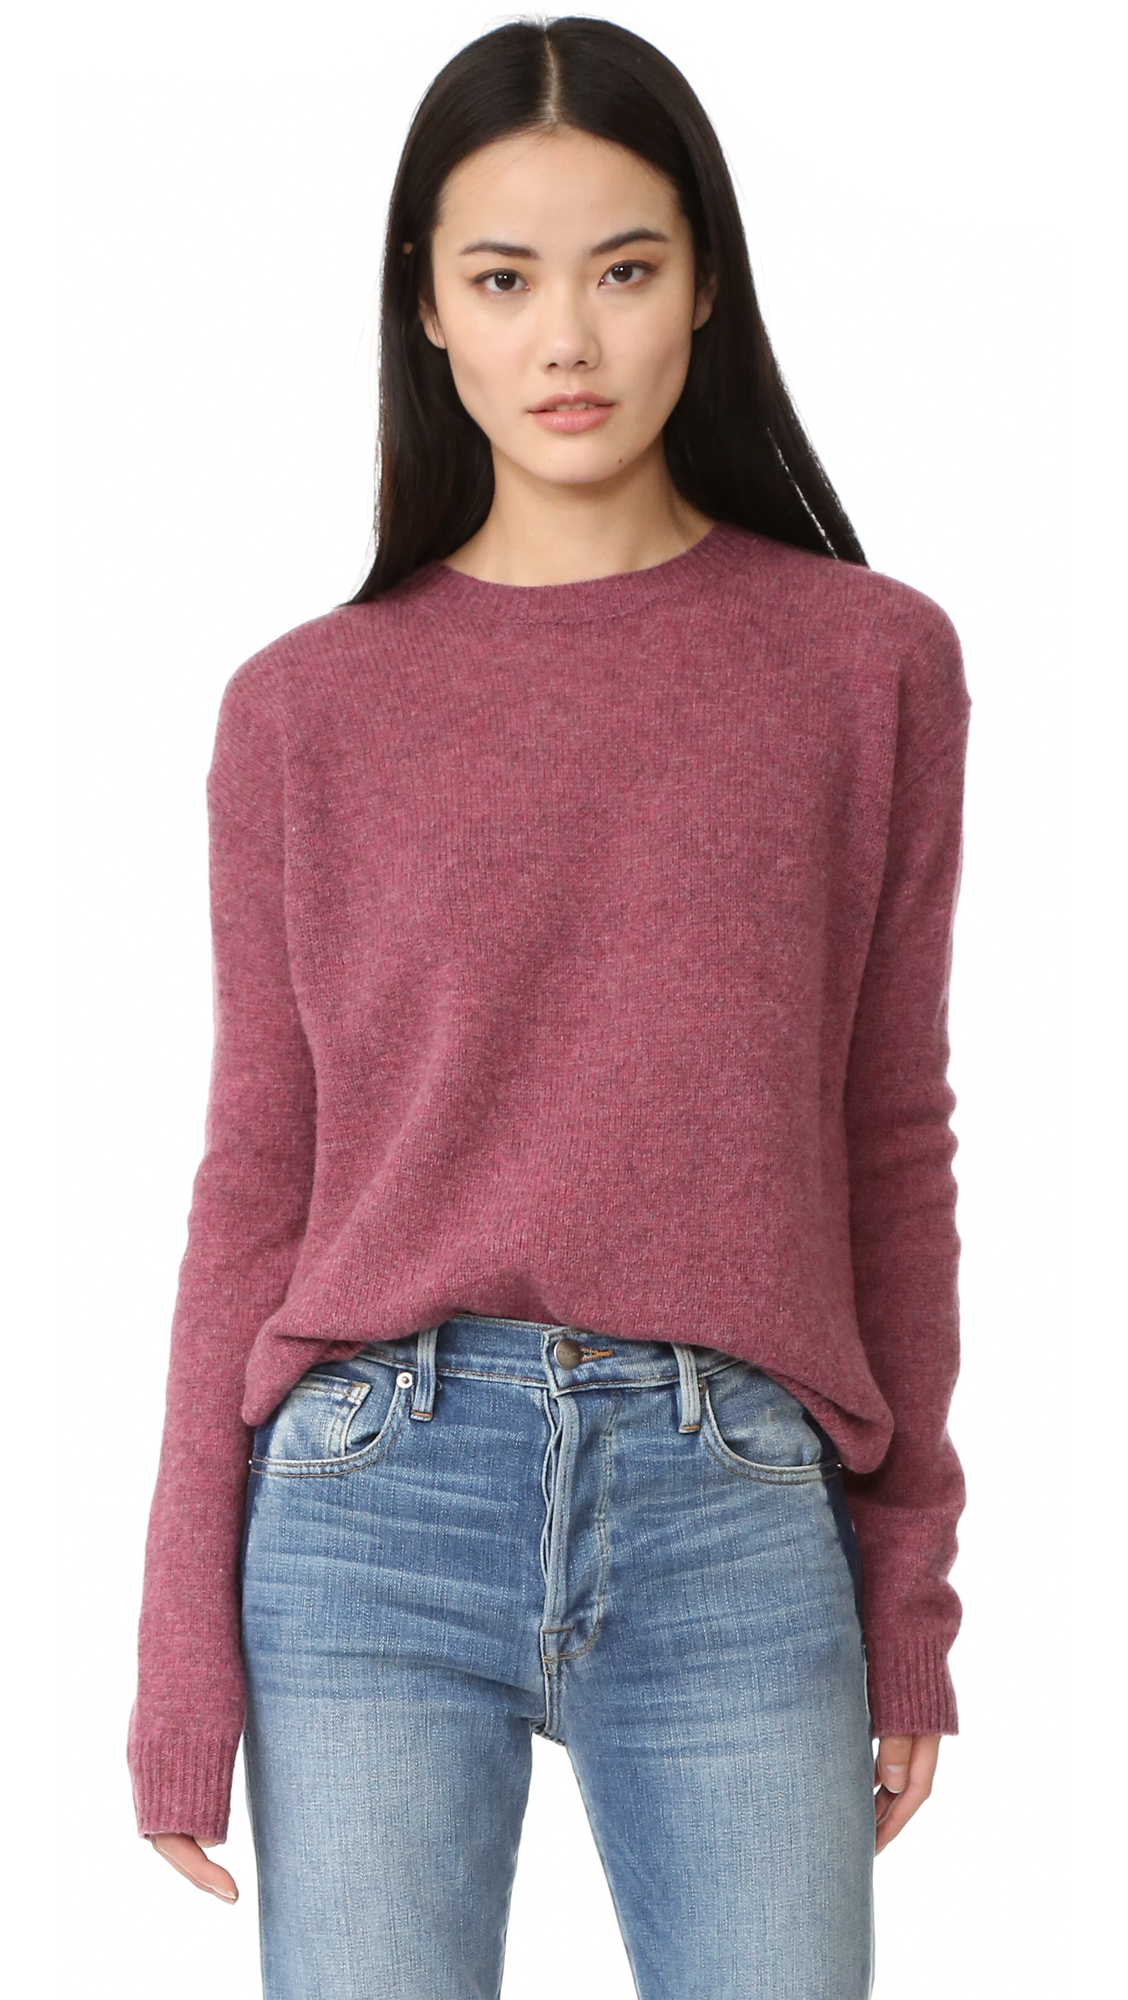 Acne Studios Deniz Wool Sweater - Pink Melange at Shopbop